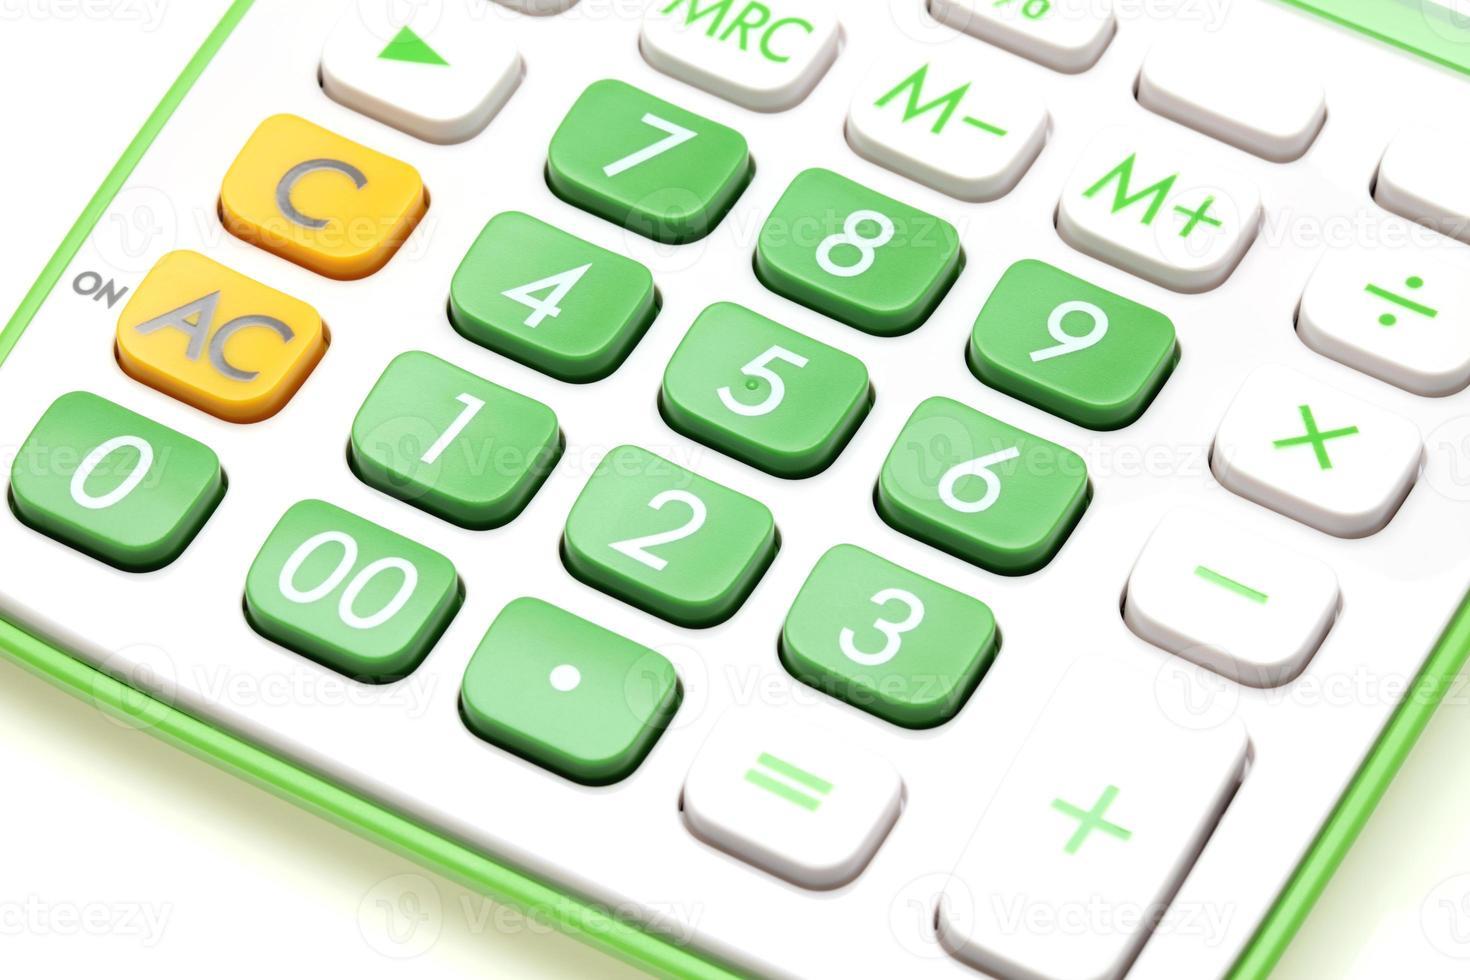 Calculator close-up photo